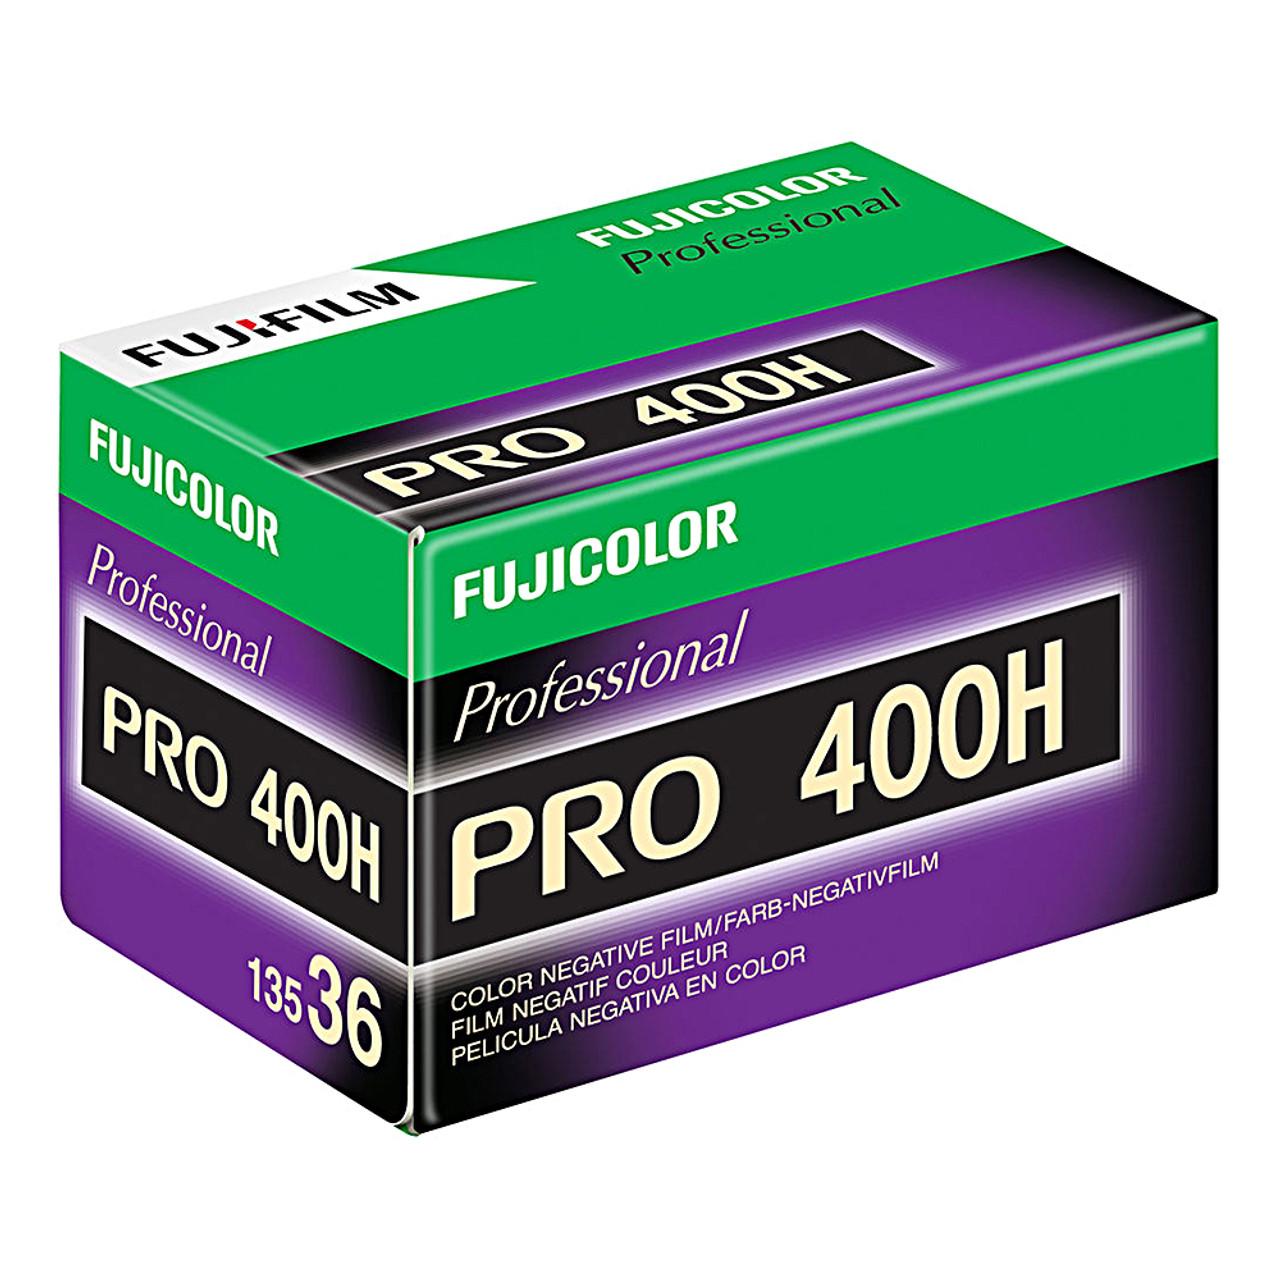 FUJICOLOR PRO 400H 135MM COLOR PRINT FILM (36EXP)